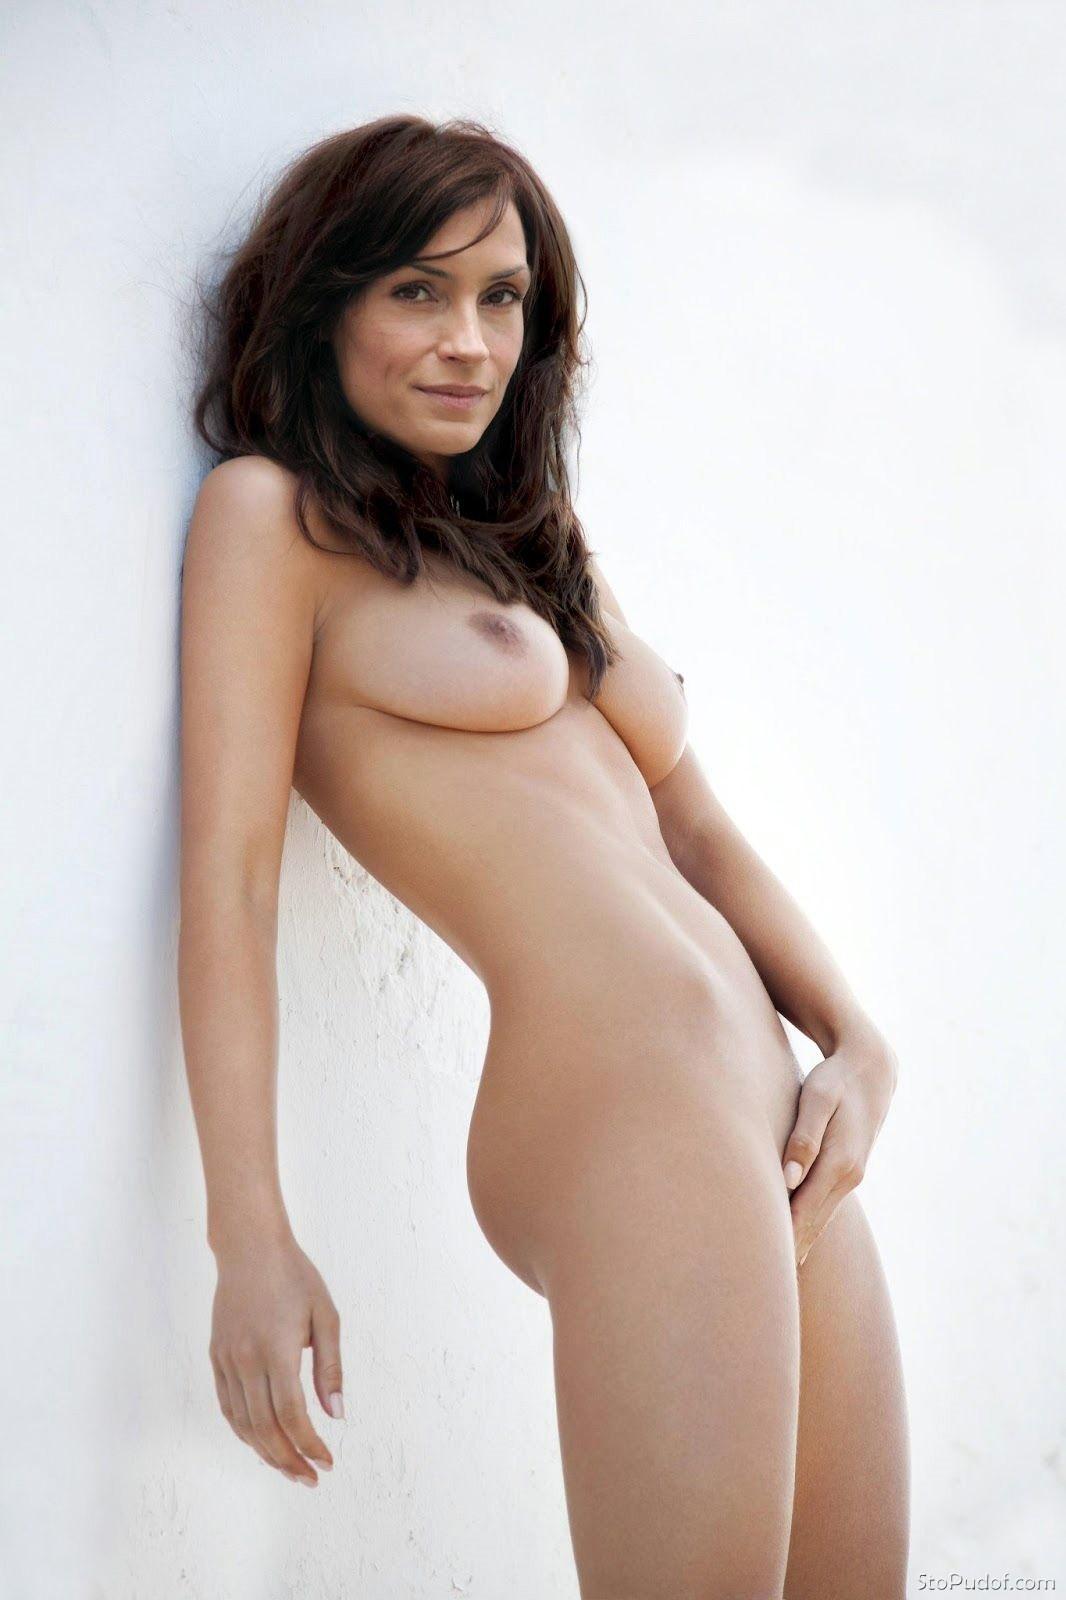 Amisha patel real nude